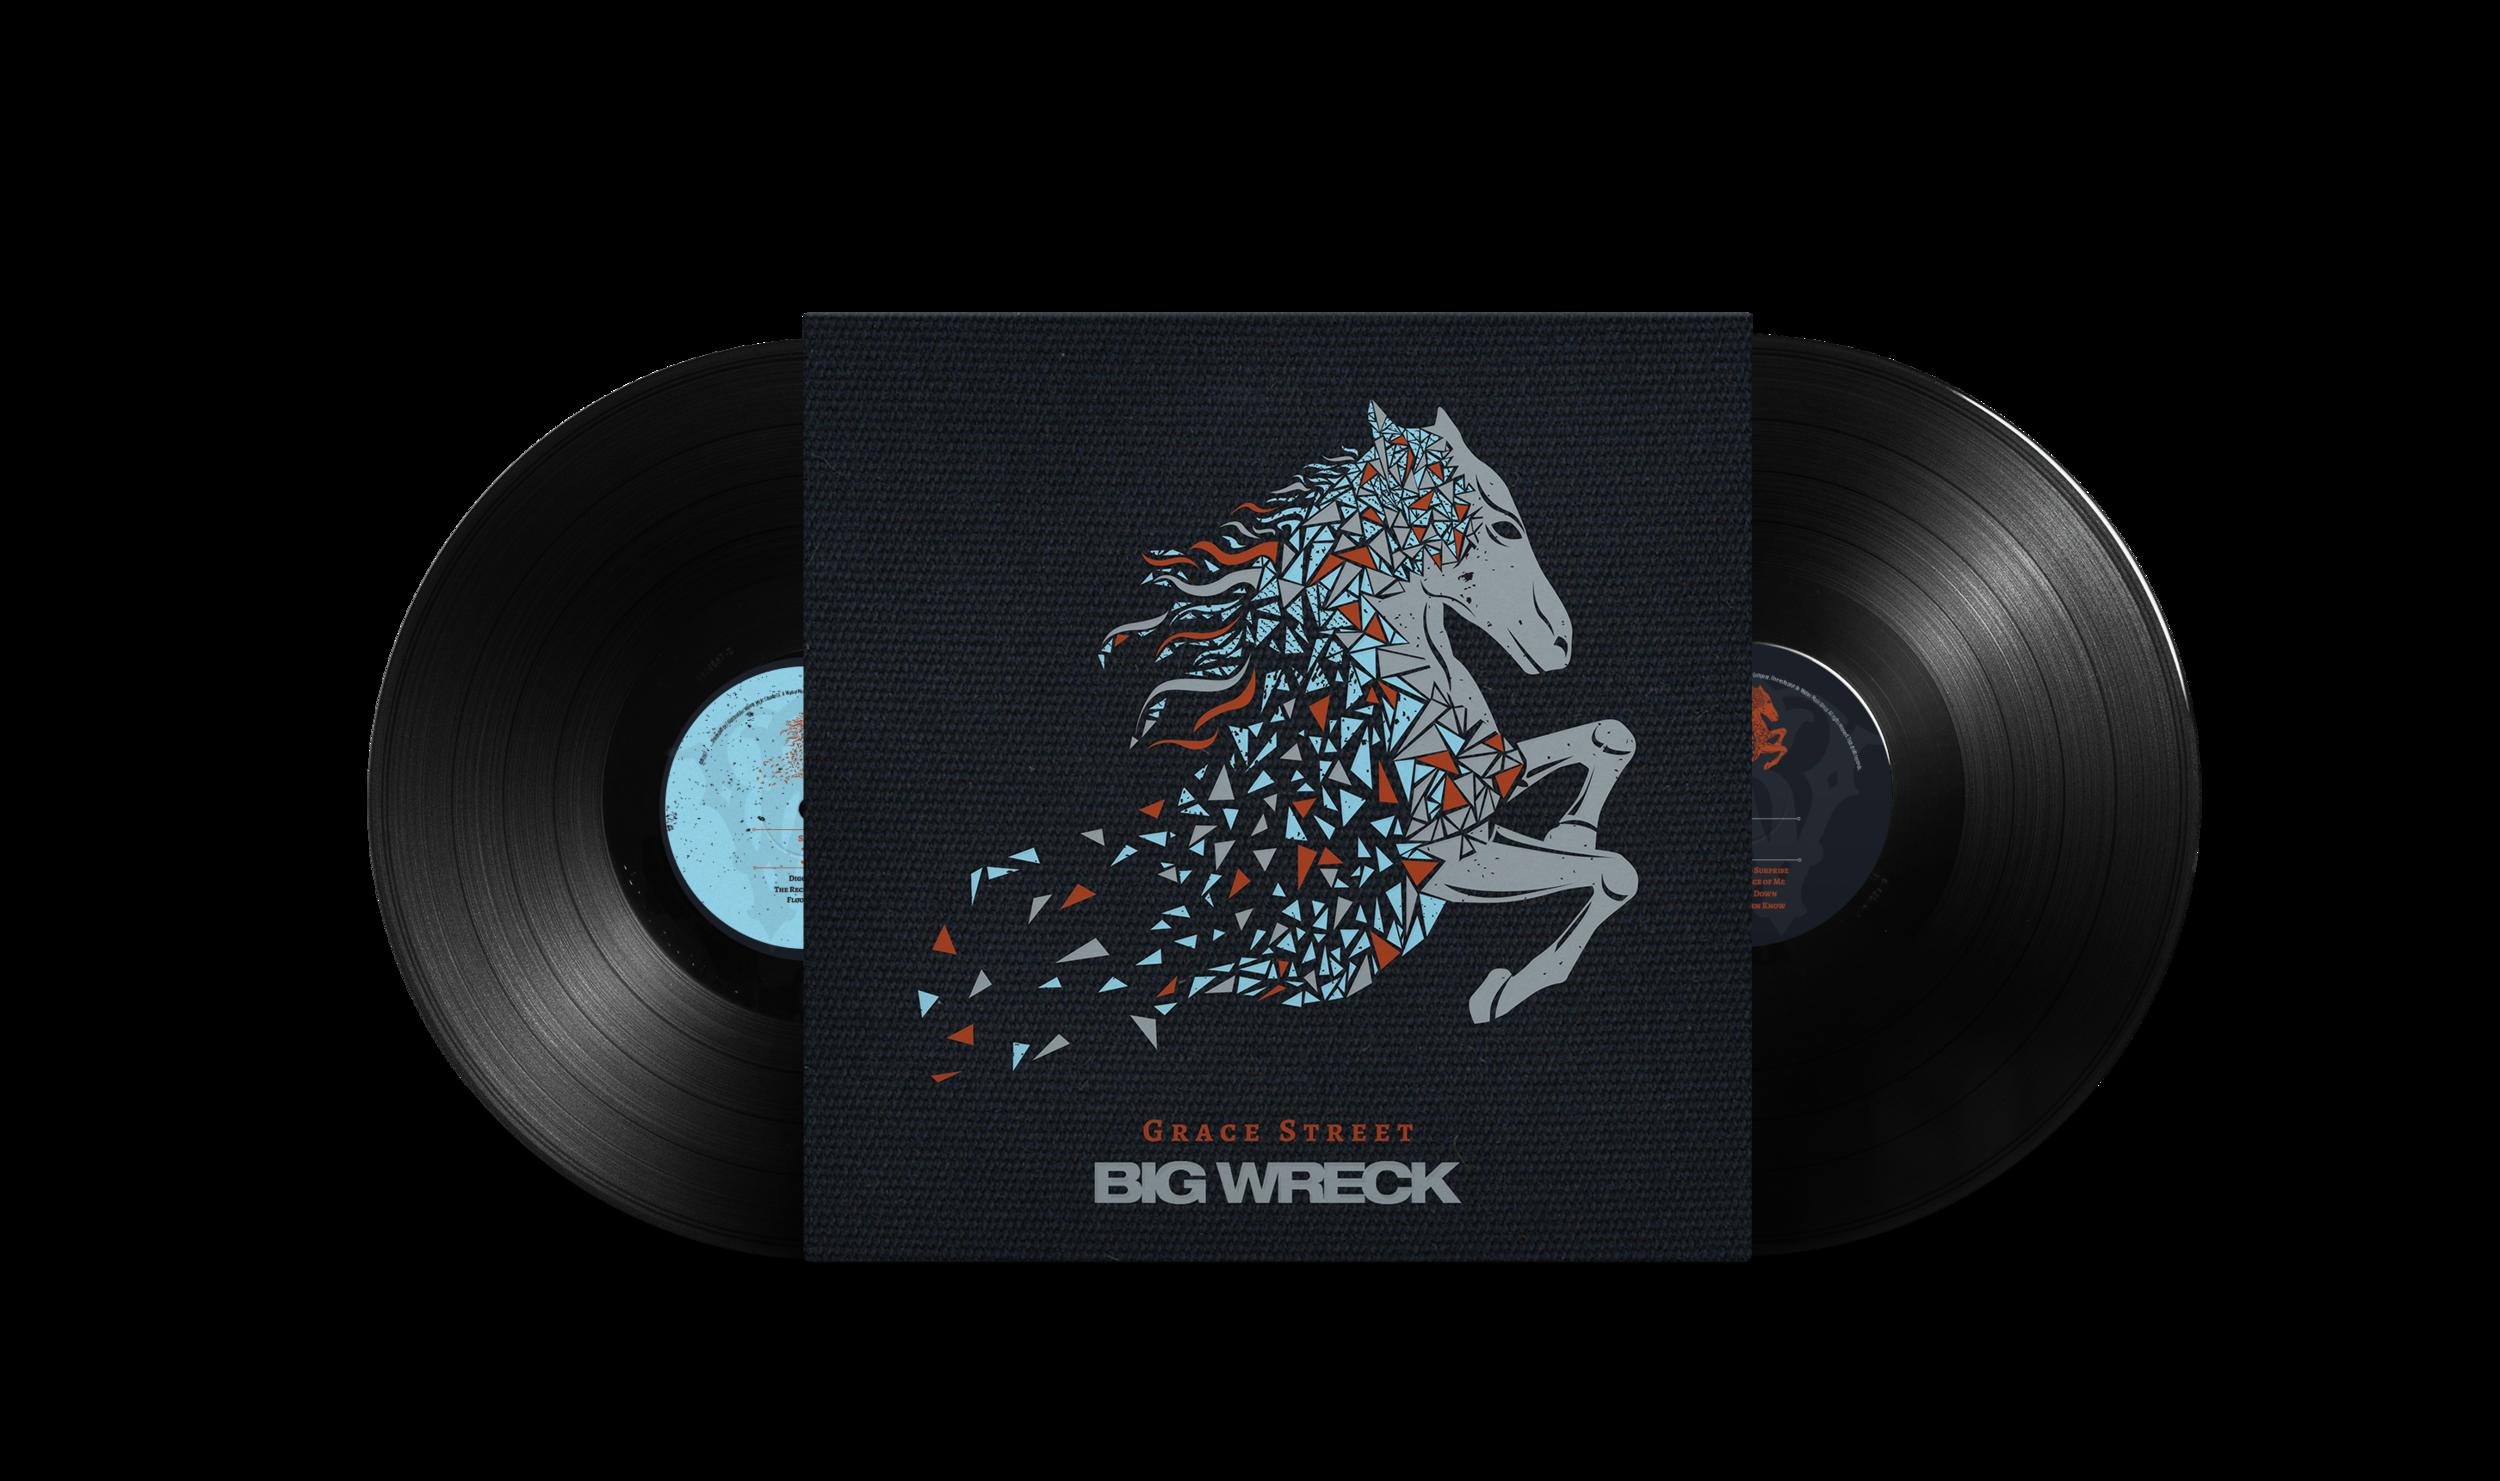 Big Wreck — Grace Street